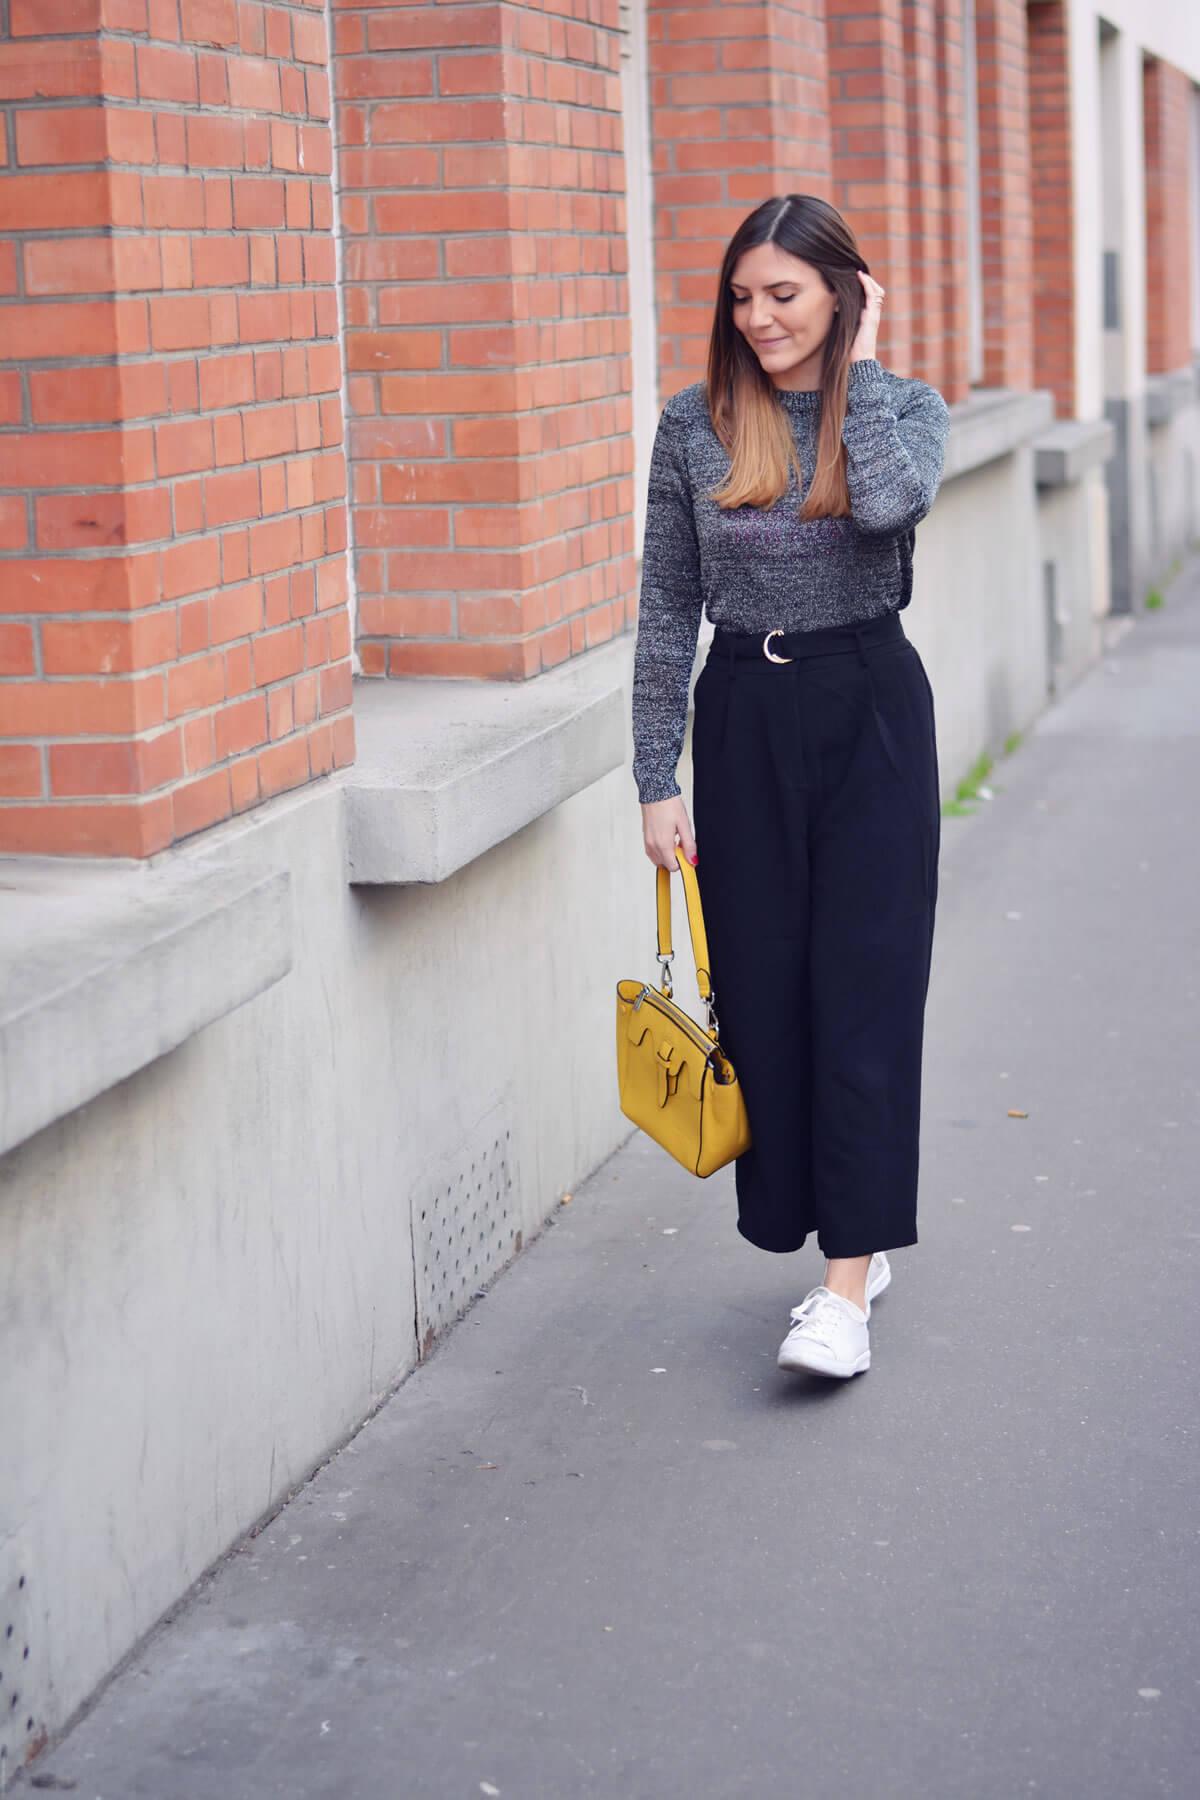 tendance jupe culotte blogueuse mode paris